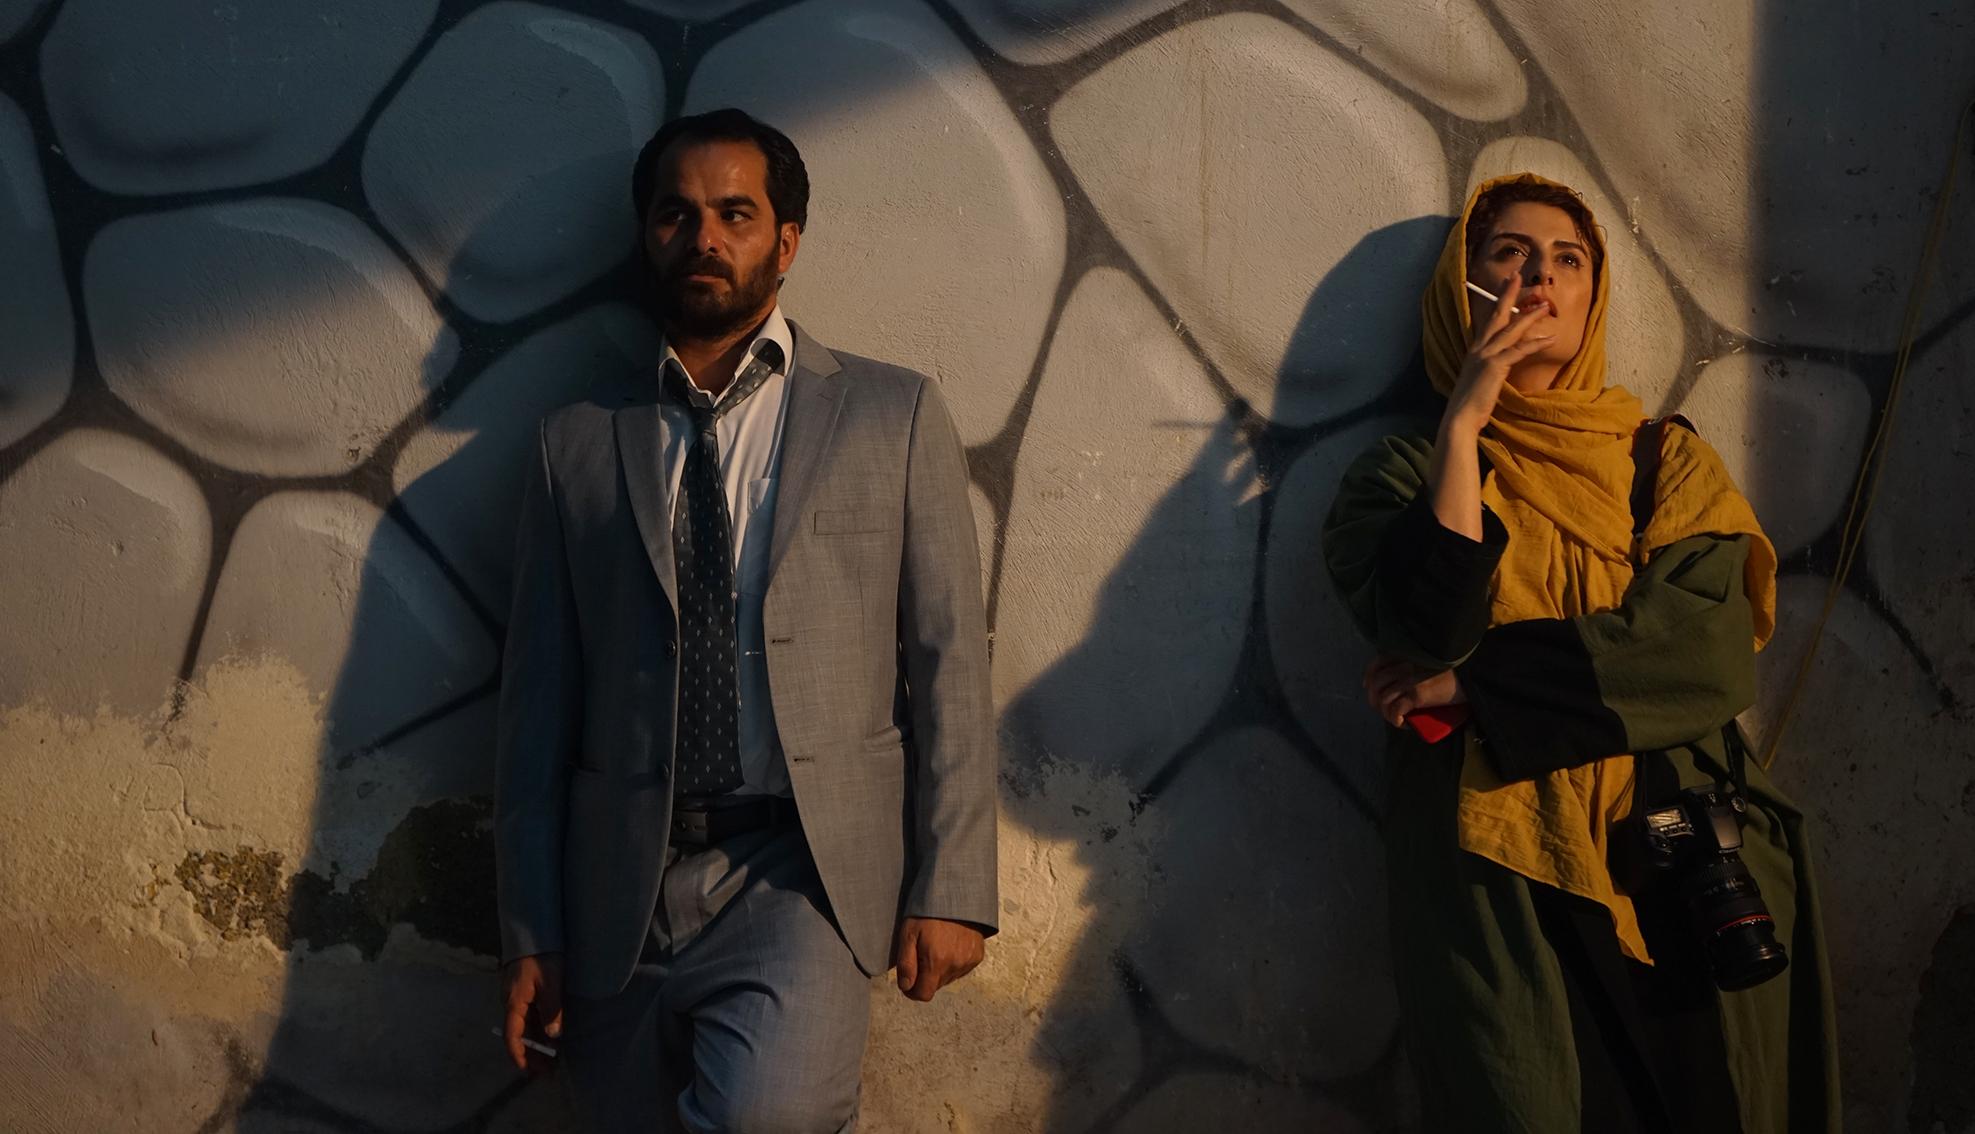 https://www.filmfest-muenchen.de/Pictures/Filme/107/5995/tehran_city_of_love-online2.jpg